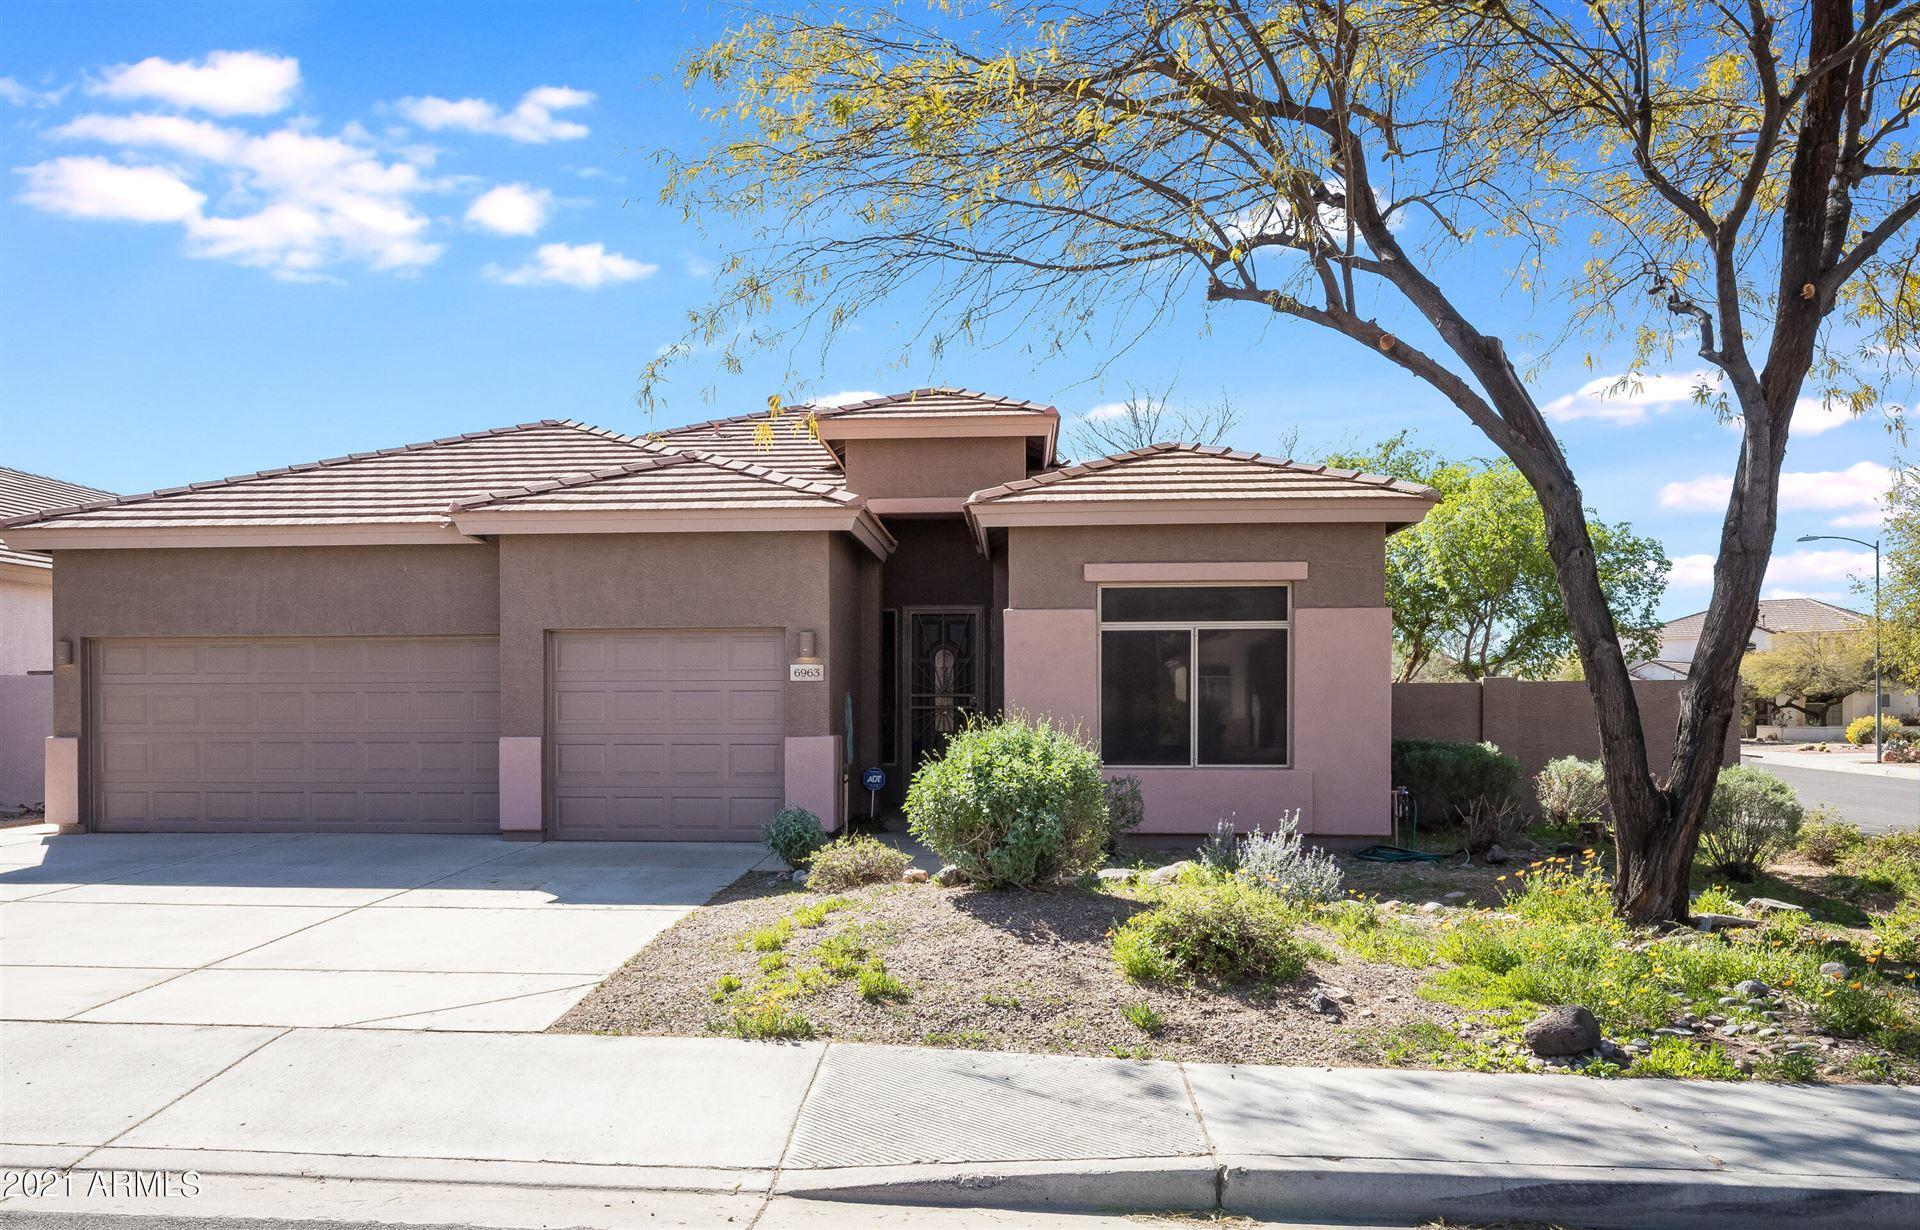 6963 W PASO Trail, Peoria, AZ 85383 - MLS#: 6199703